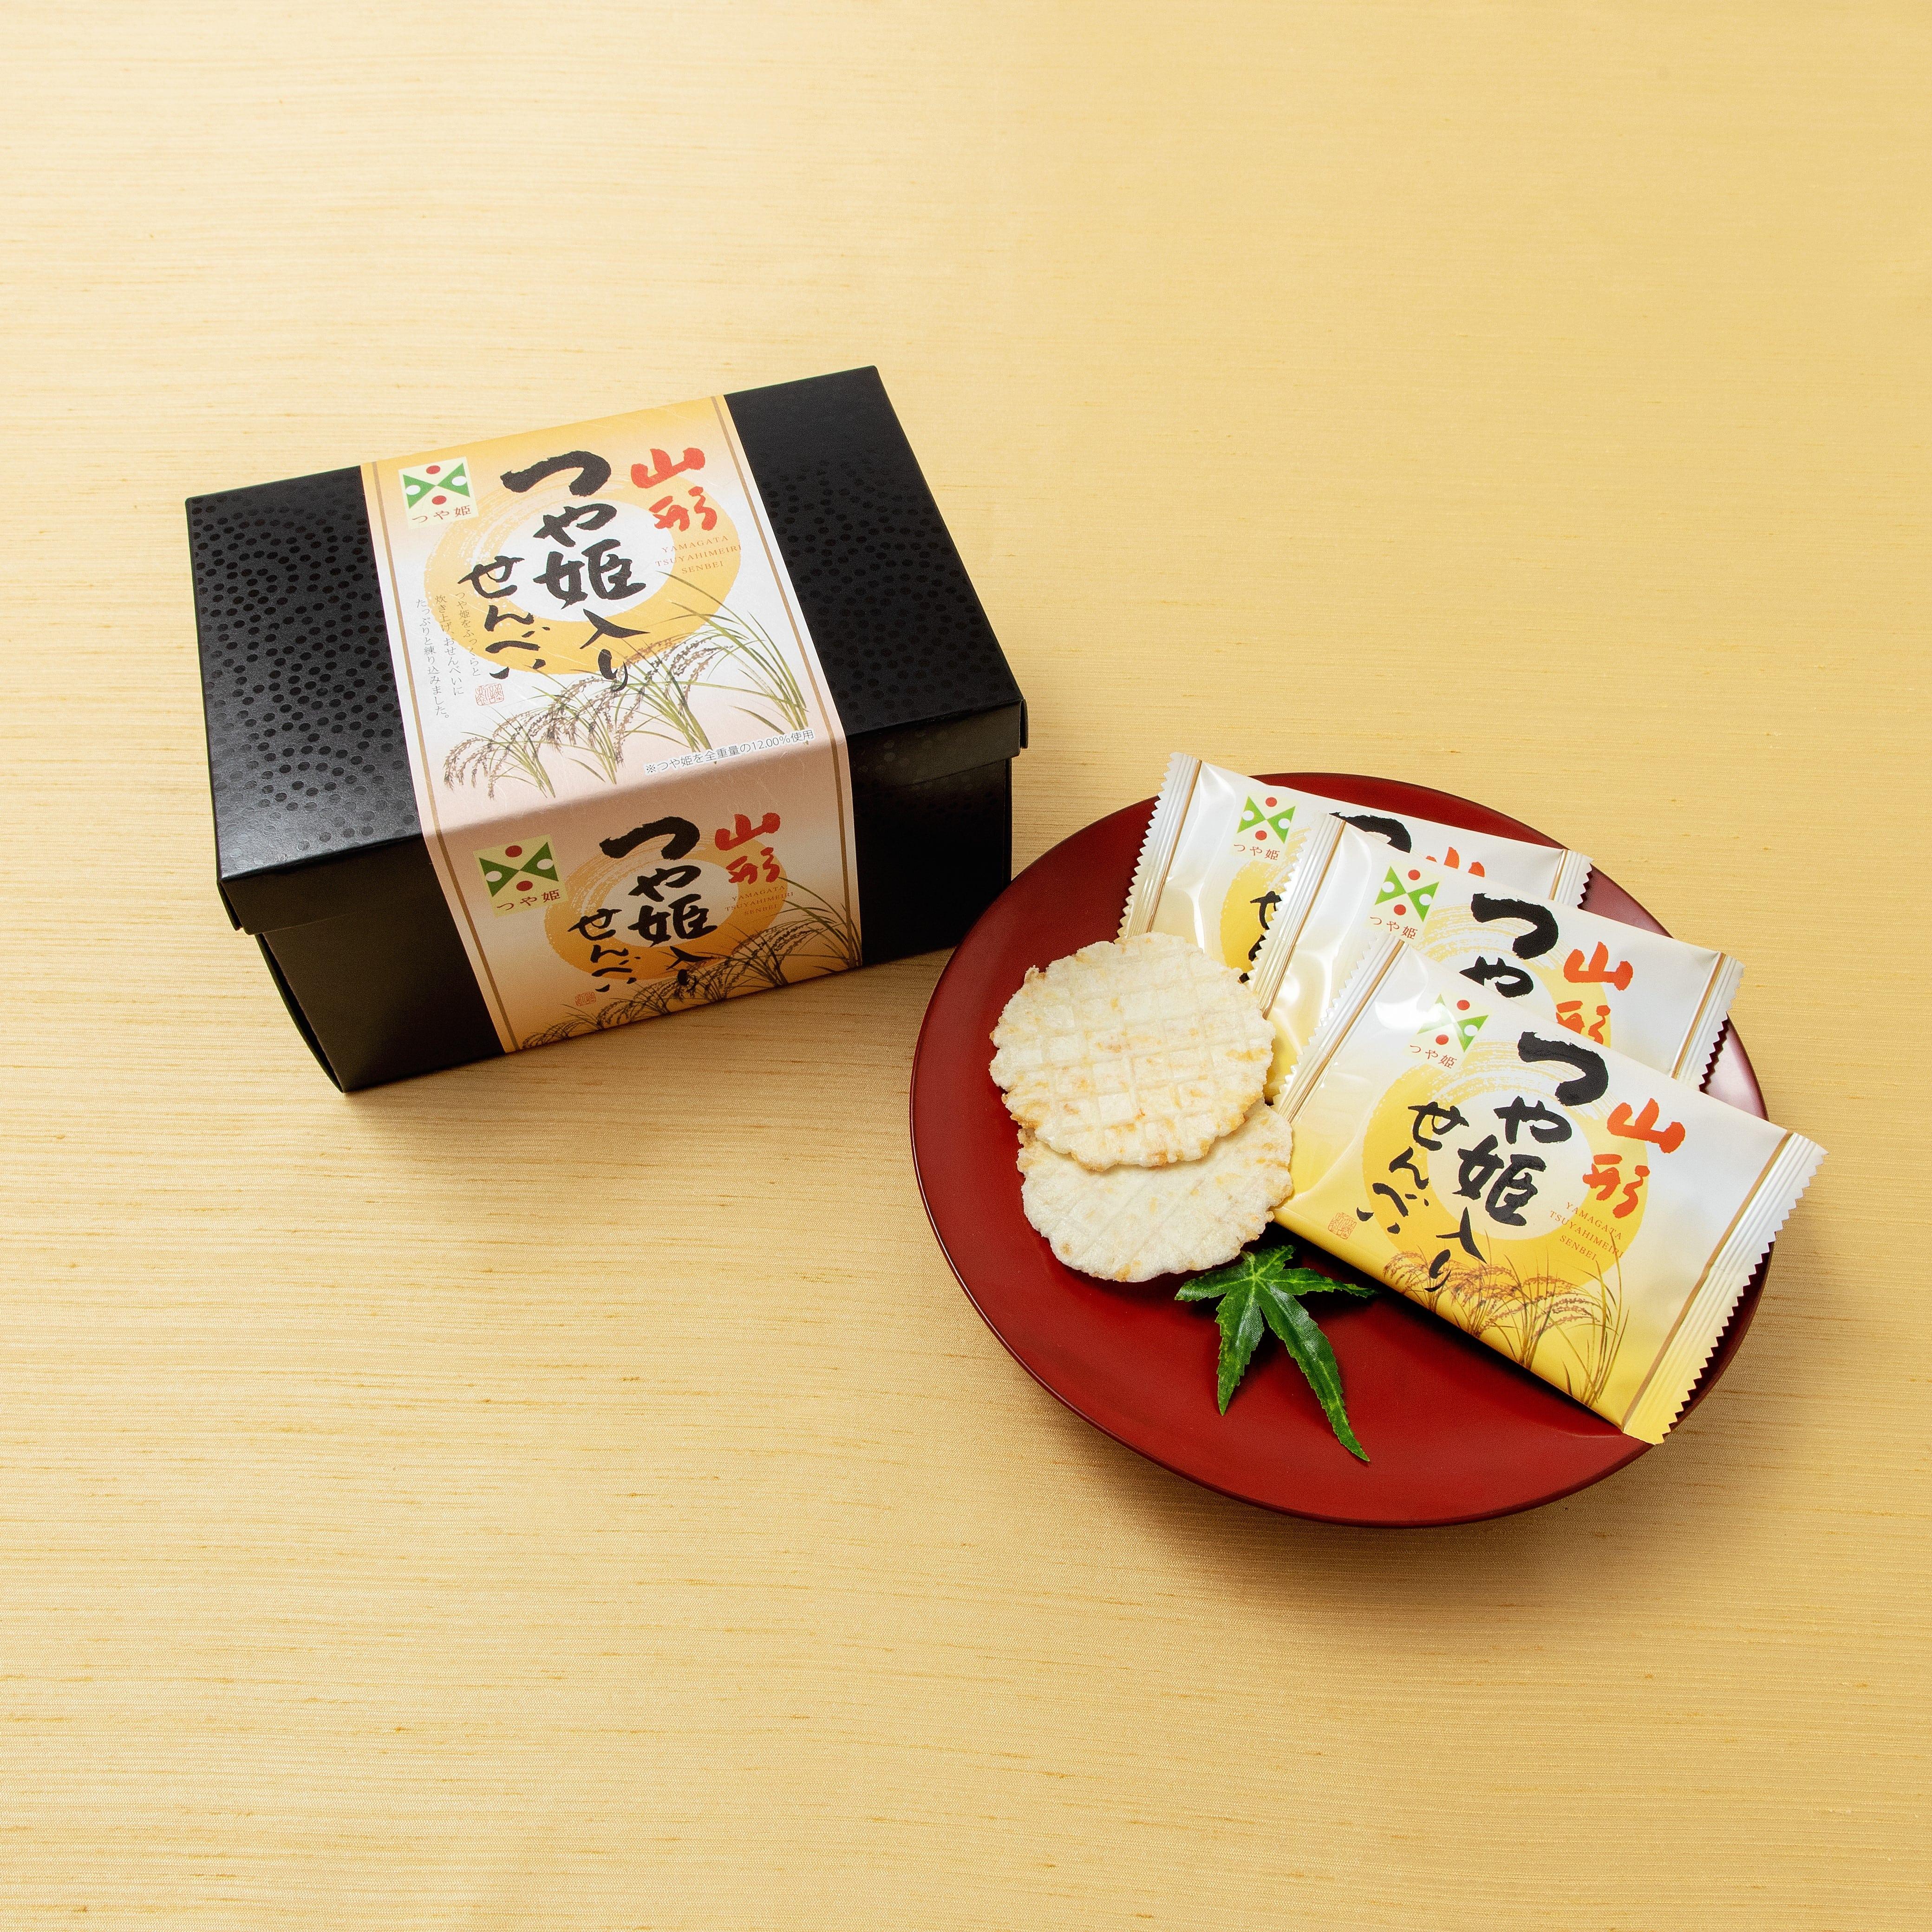 【JR東日本おみやげグランプリ2019】<山形県>つや姫せんべい2枚×16袋 送料無料